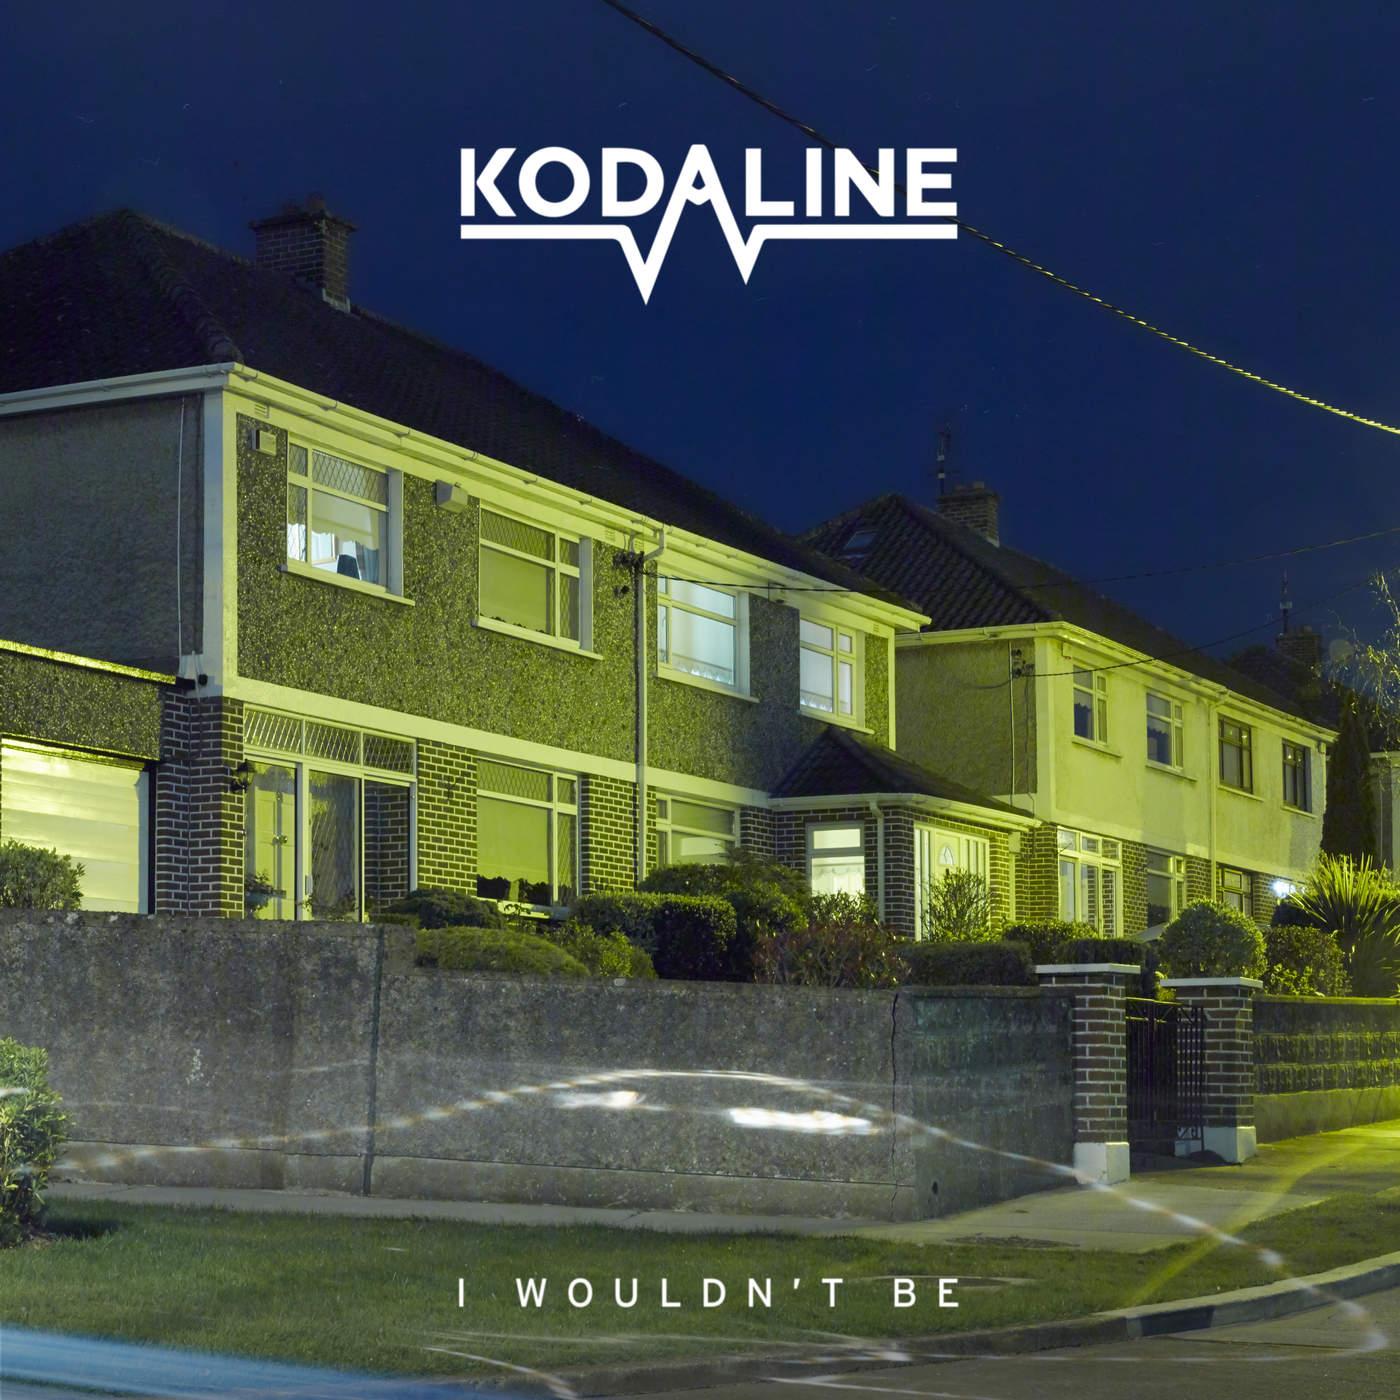 Kodaline - I Wouldn't Be - EP